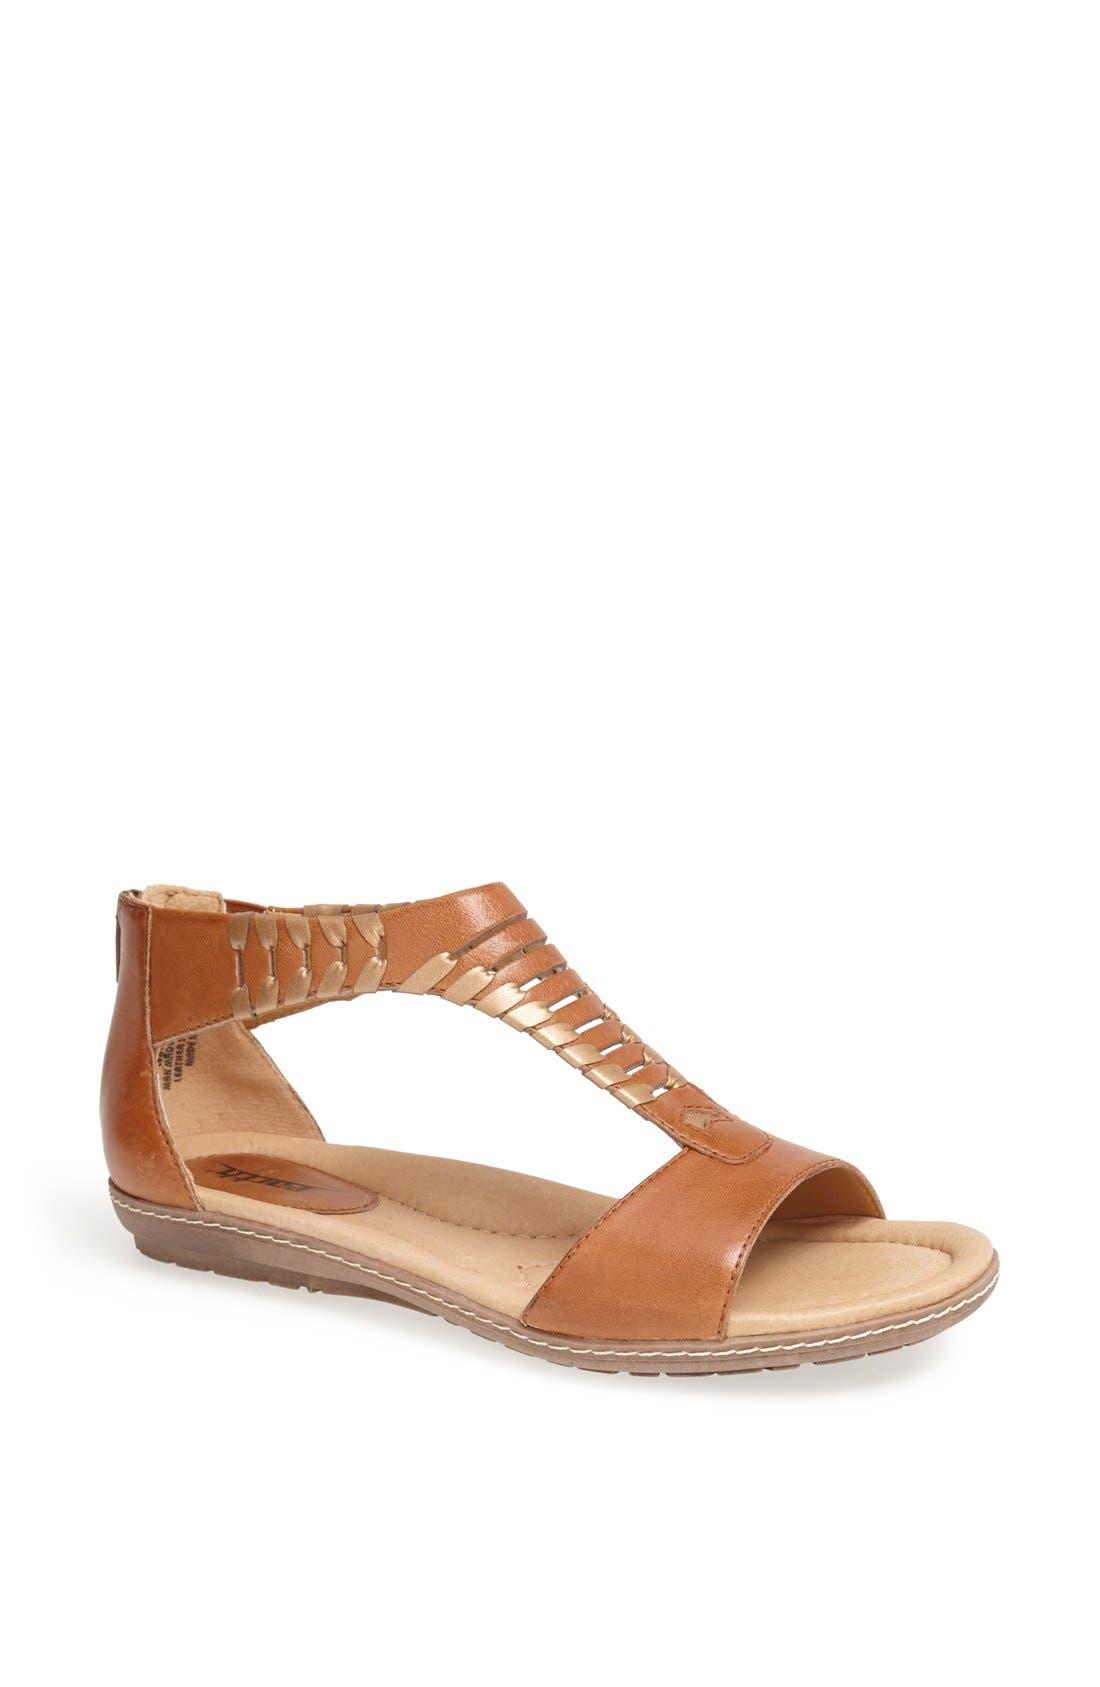 Main Image - Earth® 'Shell' Cutout Leather Sandal